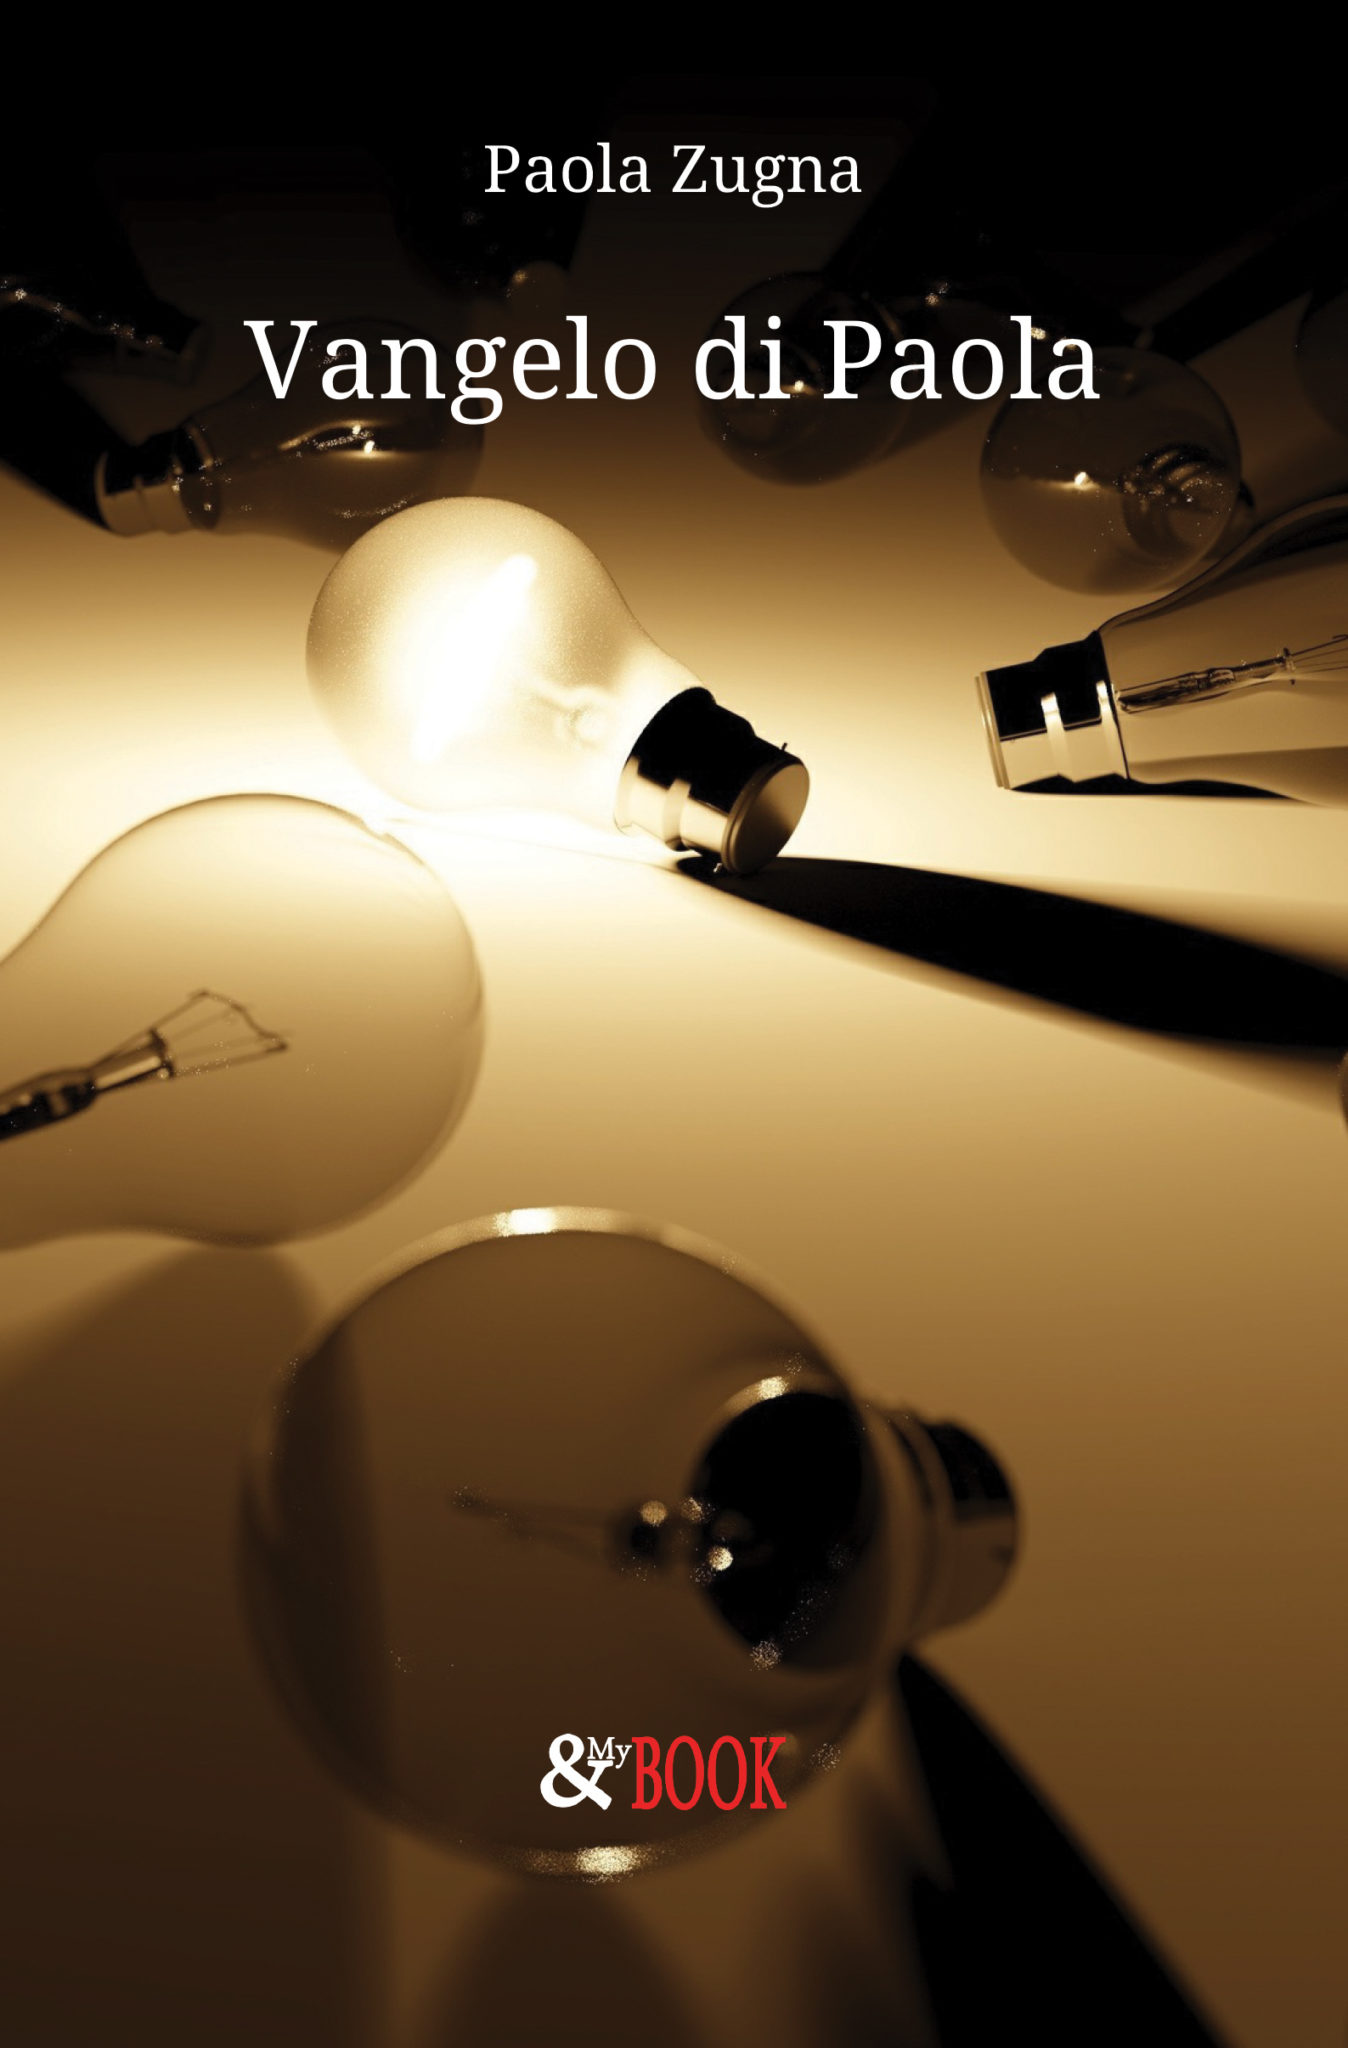 Vangelo di Paola